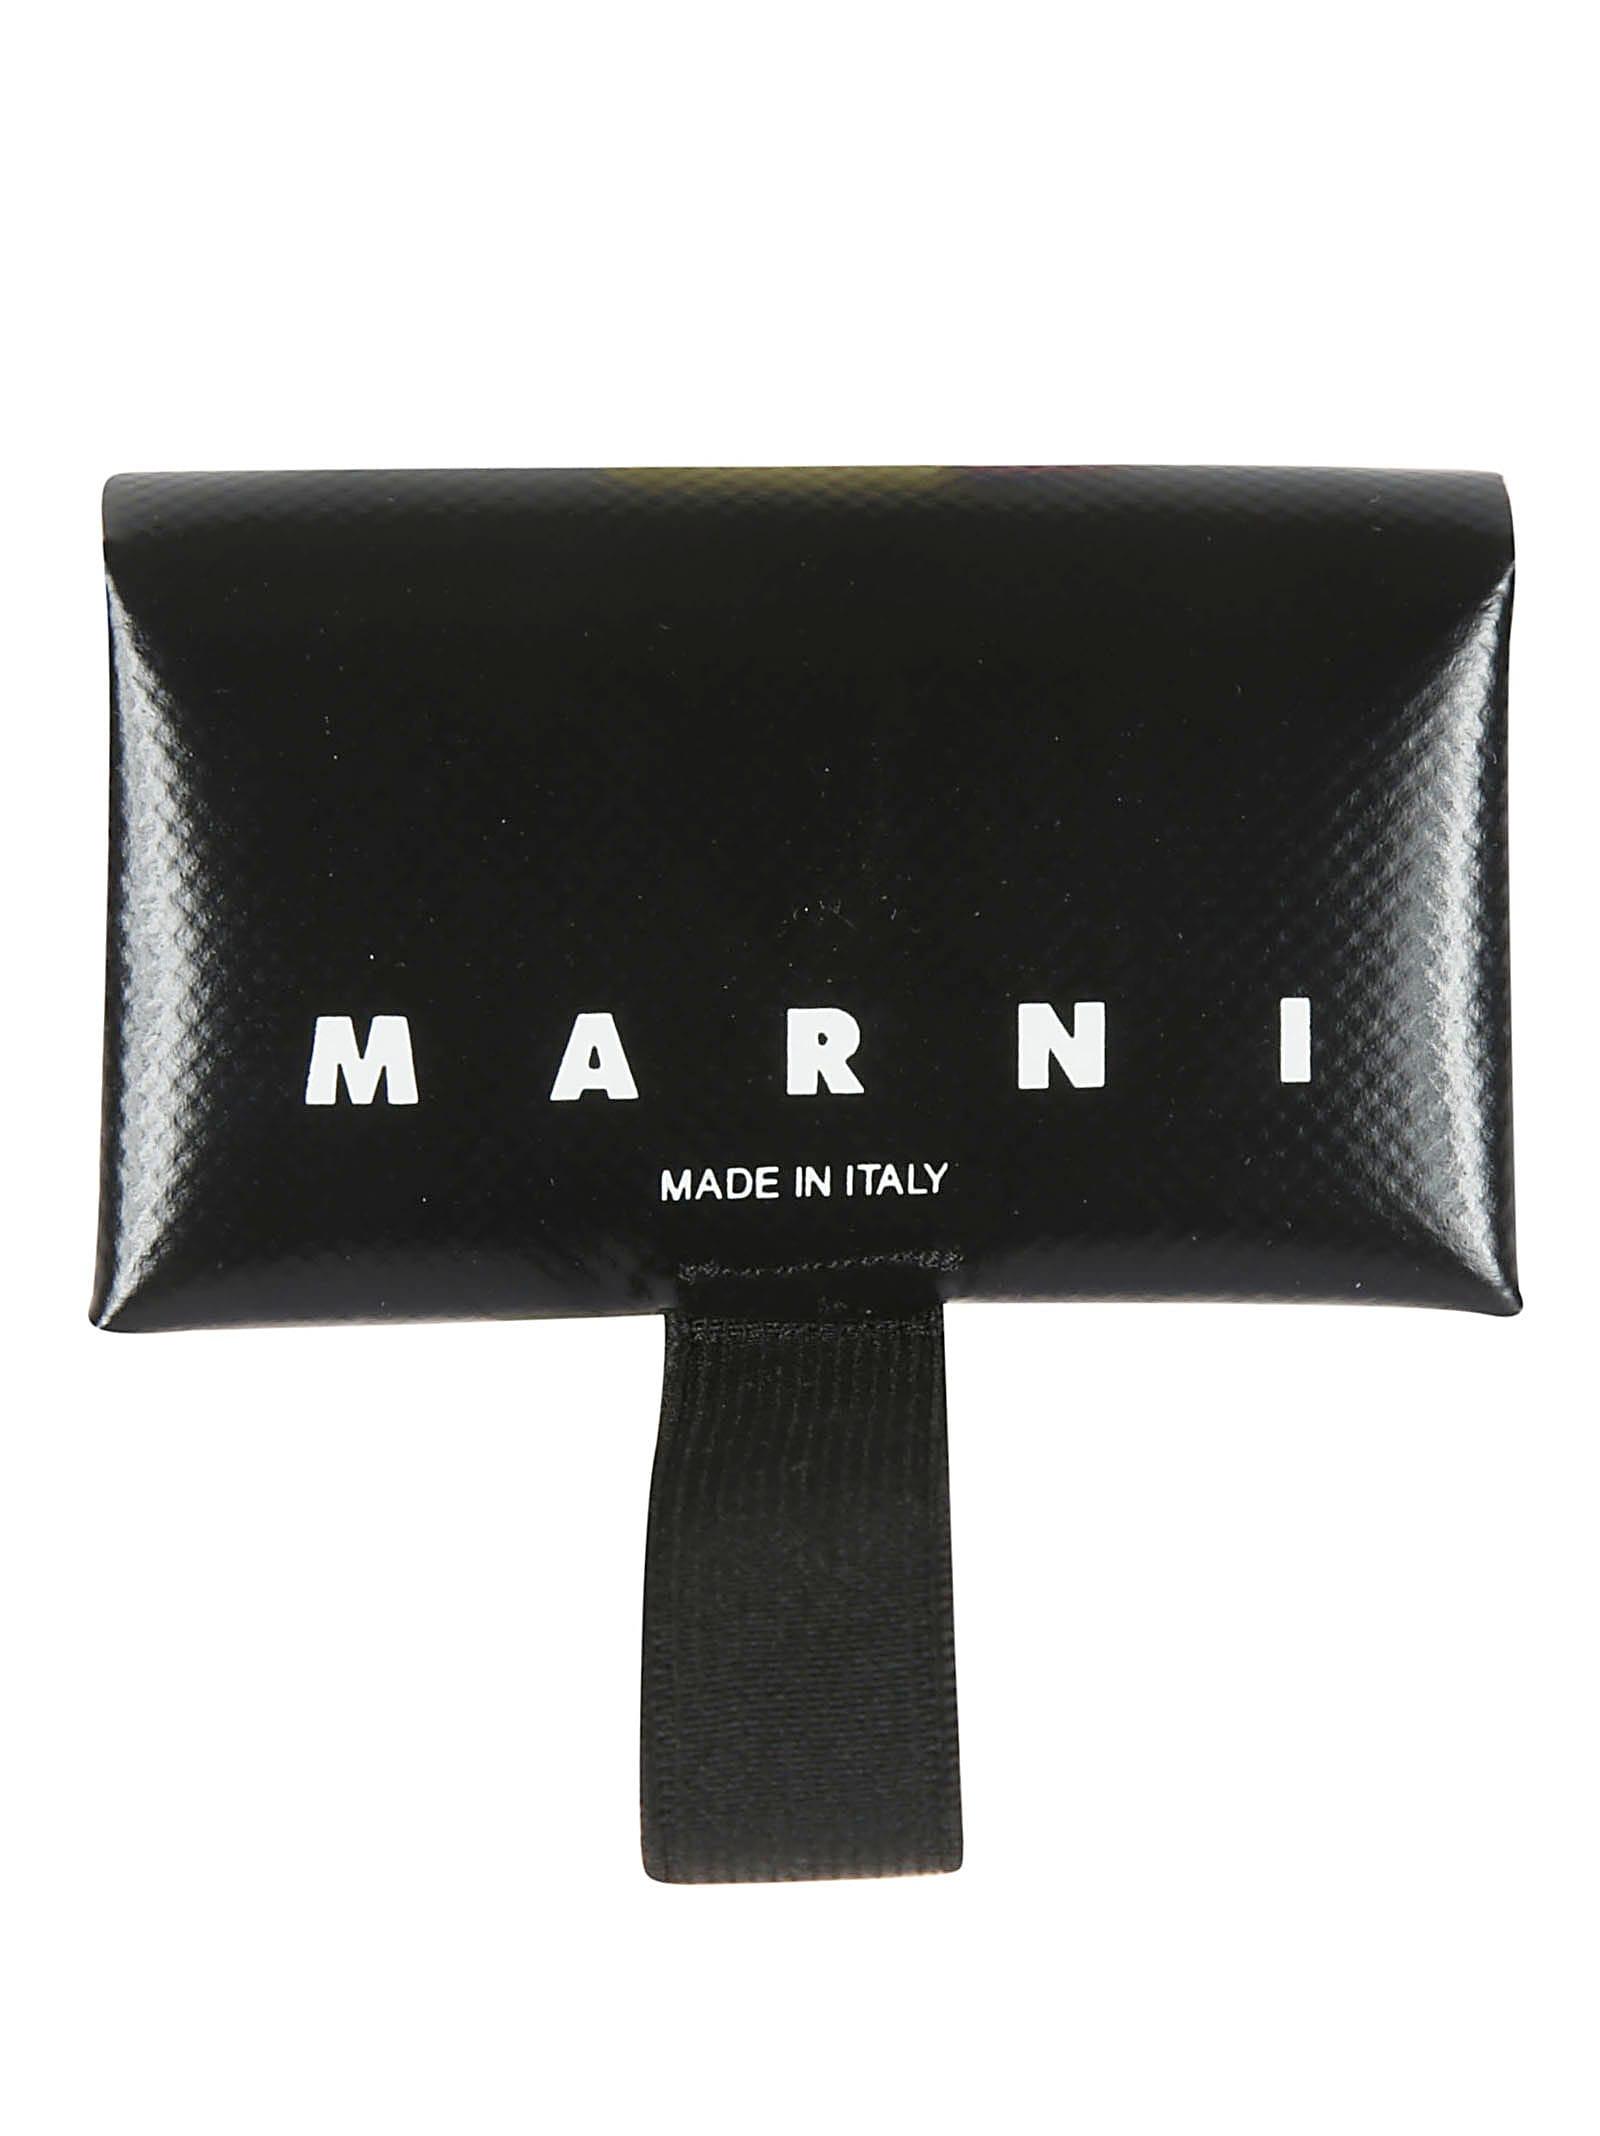 Marni Logo Print Leather Wallet In Black